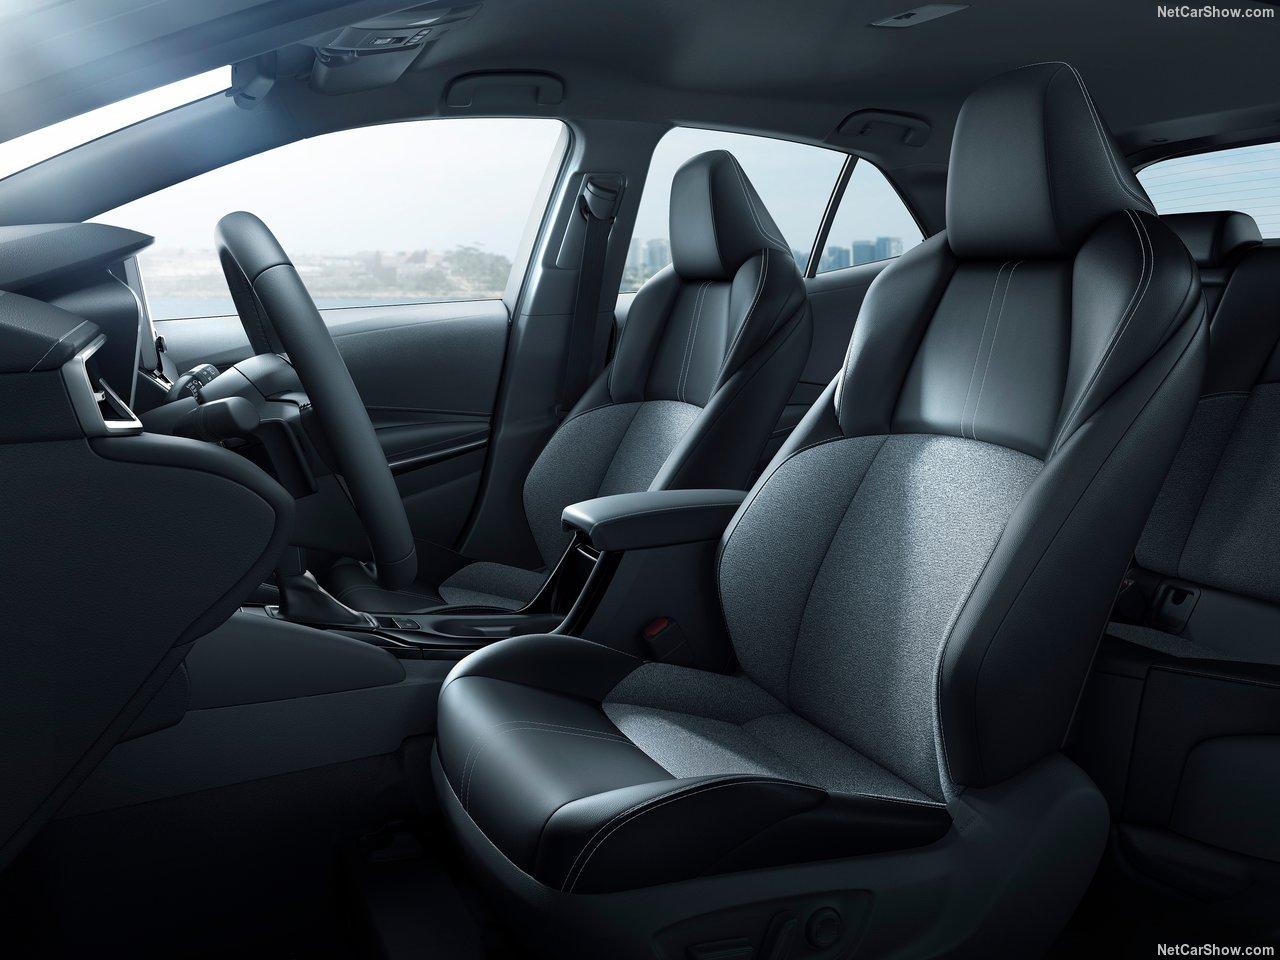 Toyota-Corolla_Hatchback-2019-1280-33.jpg